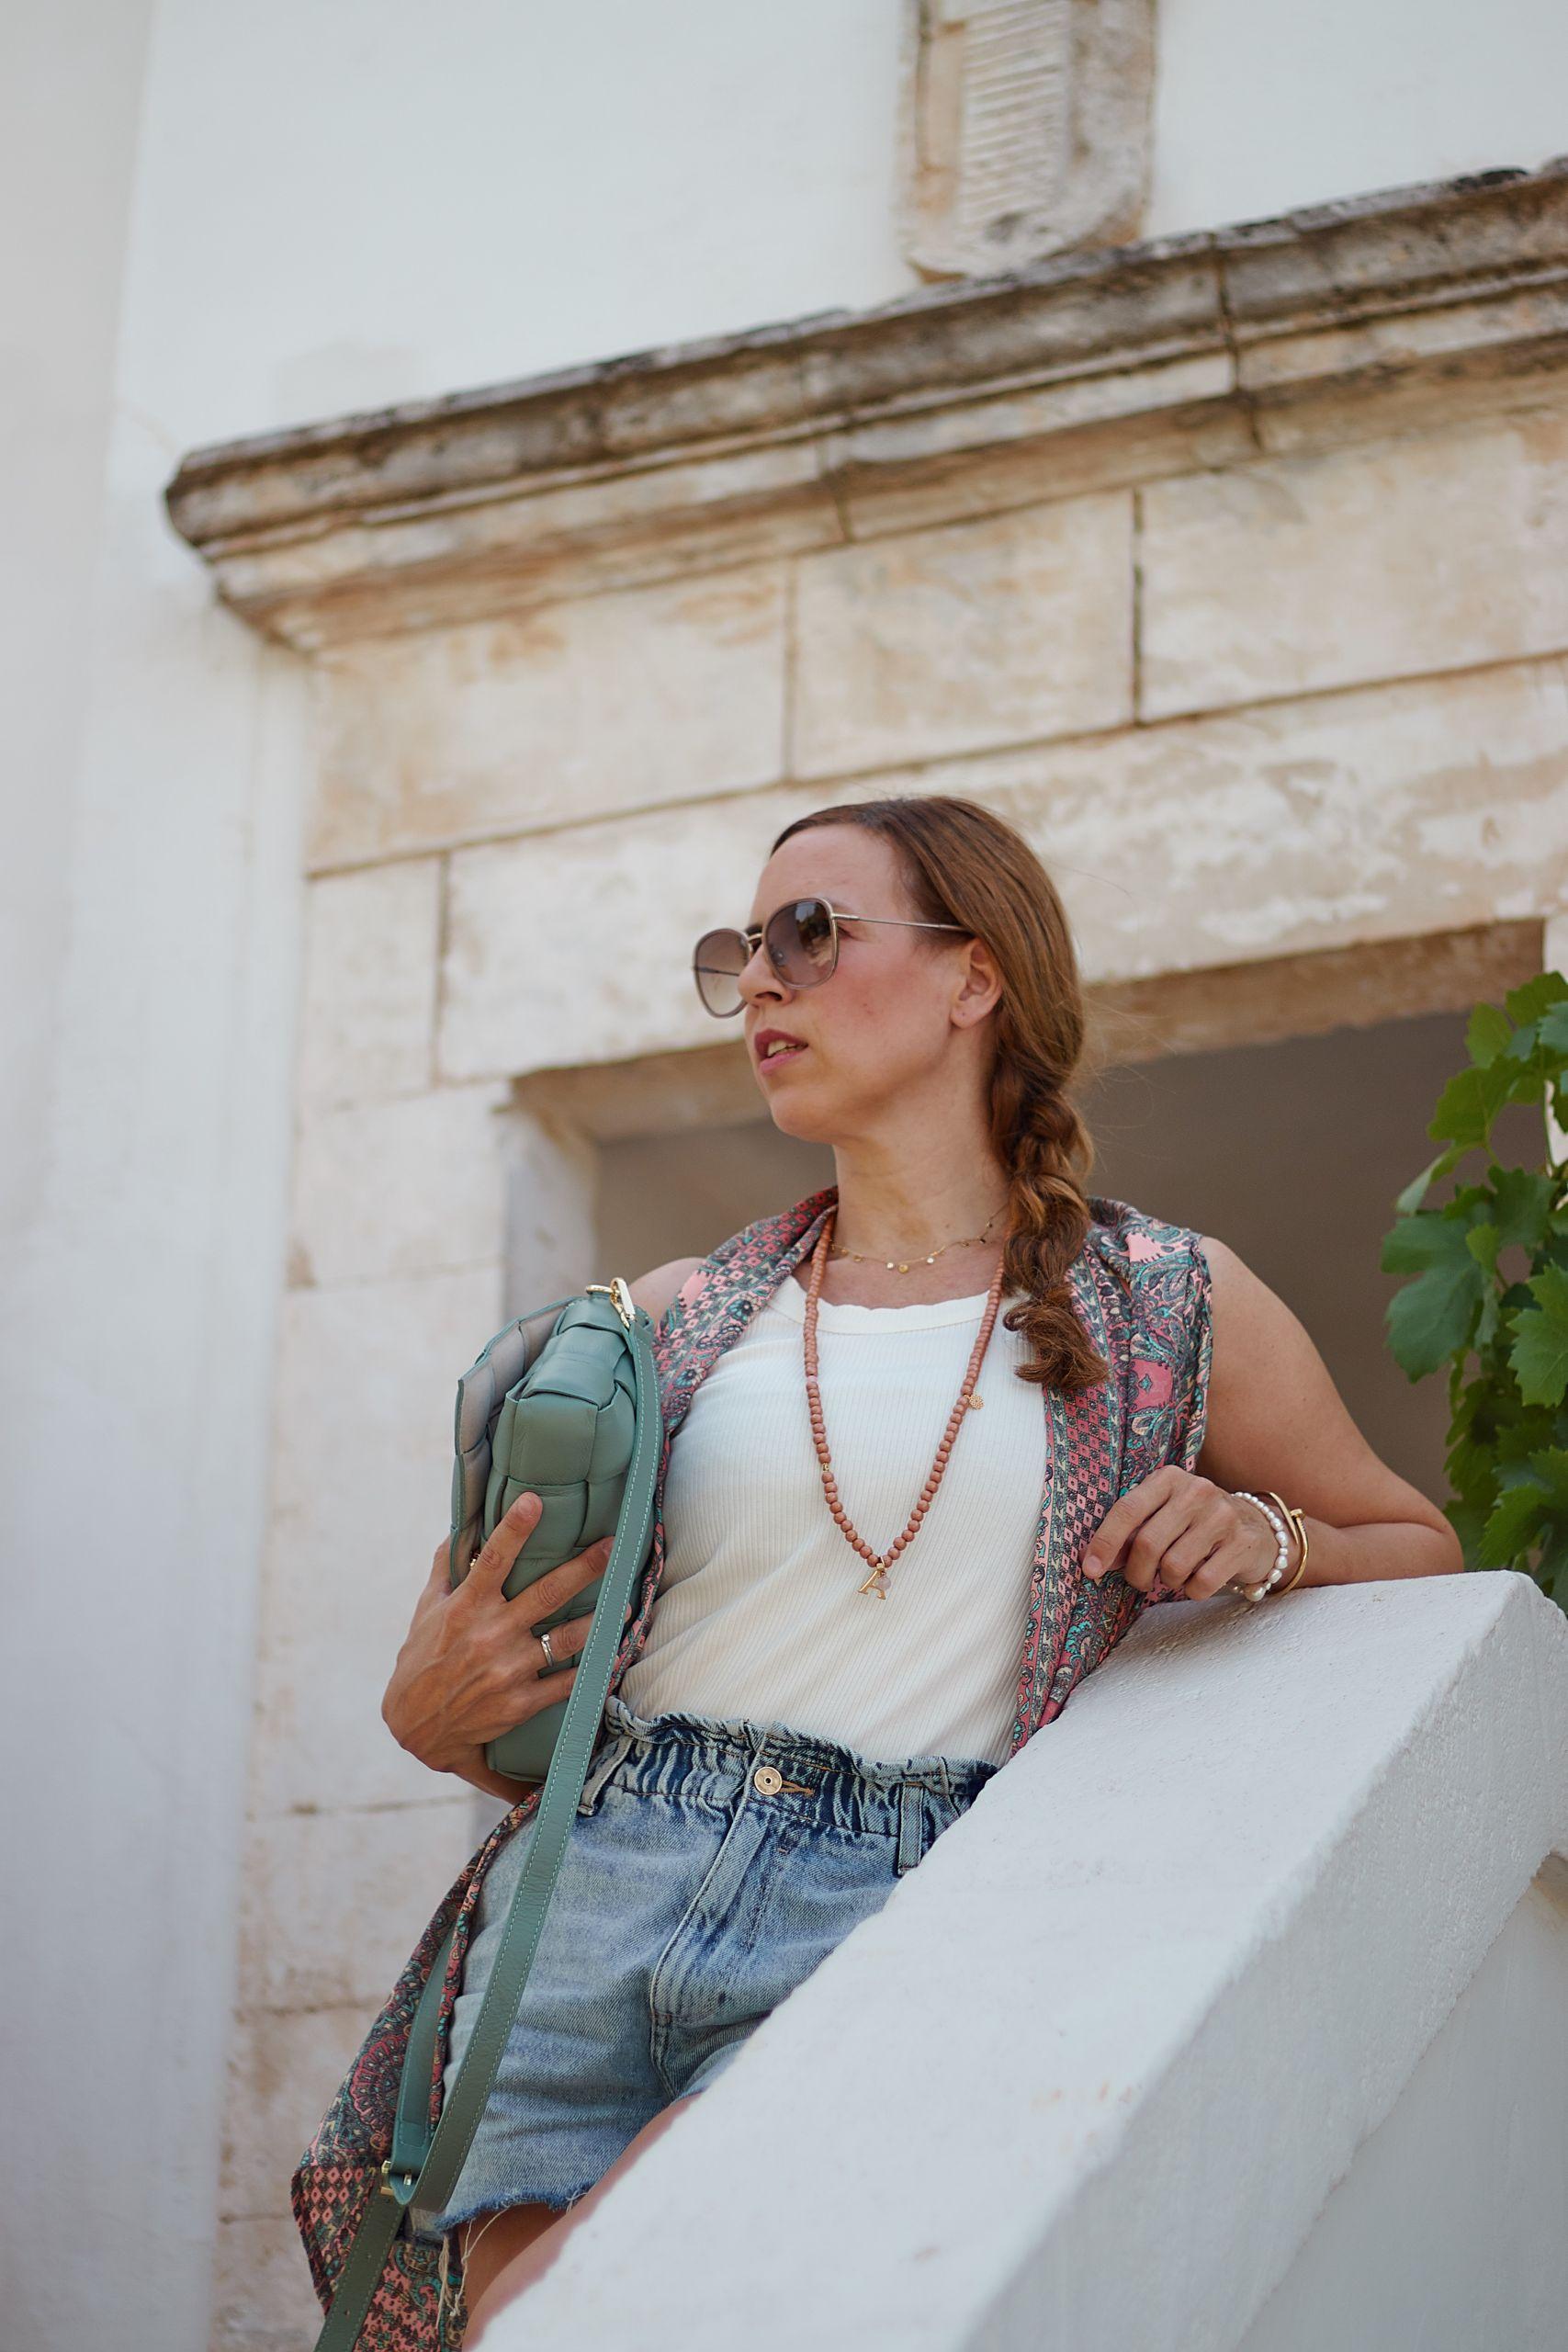 Settimo Cielo Bologna Kimono zu Shorts, Tank Top und Ledertasche in der Masseria Salinola bei Ostuni